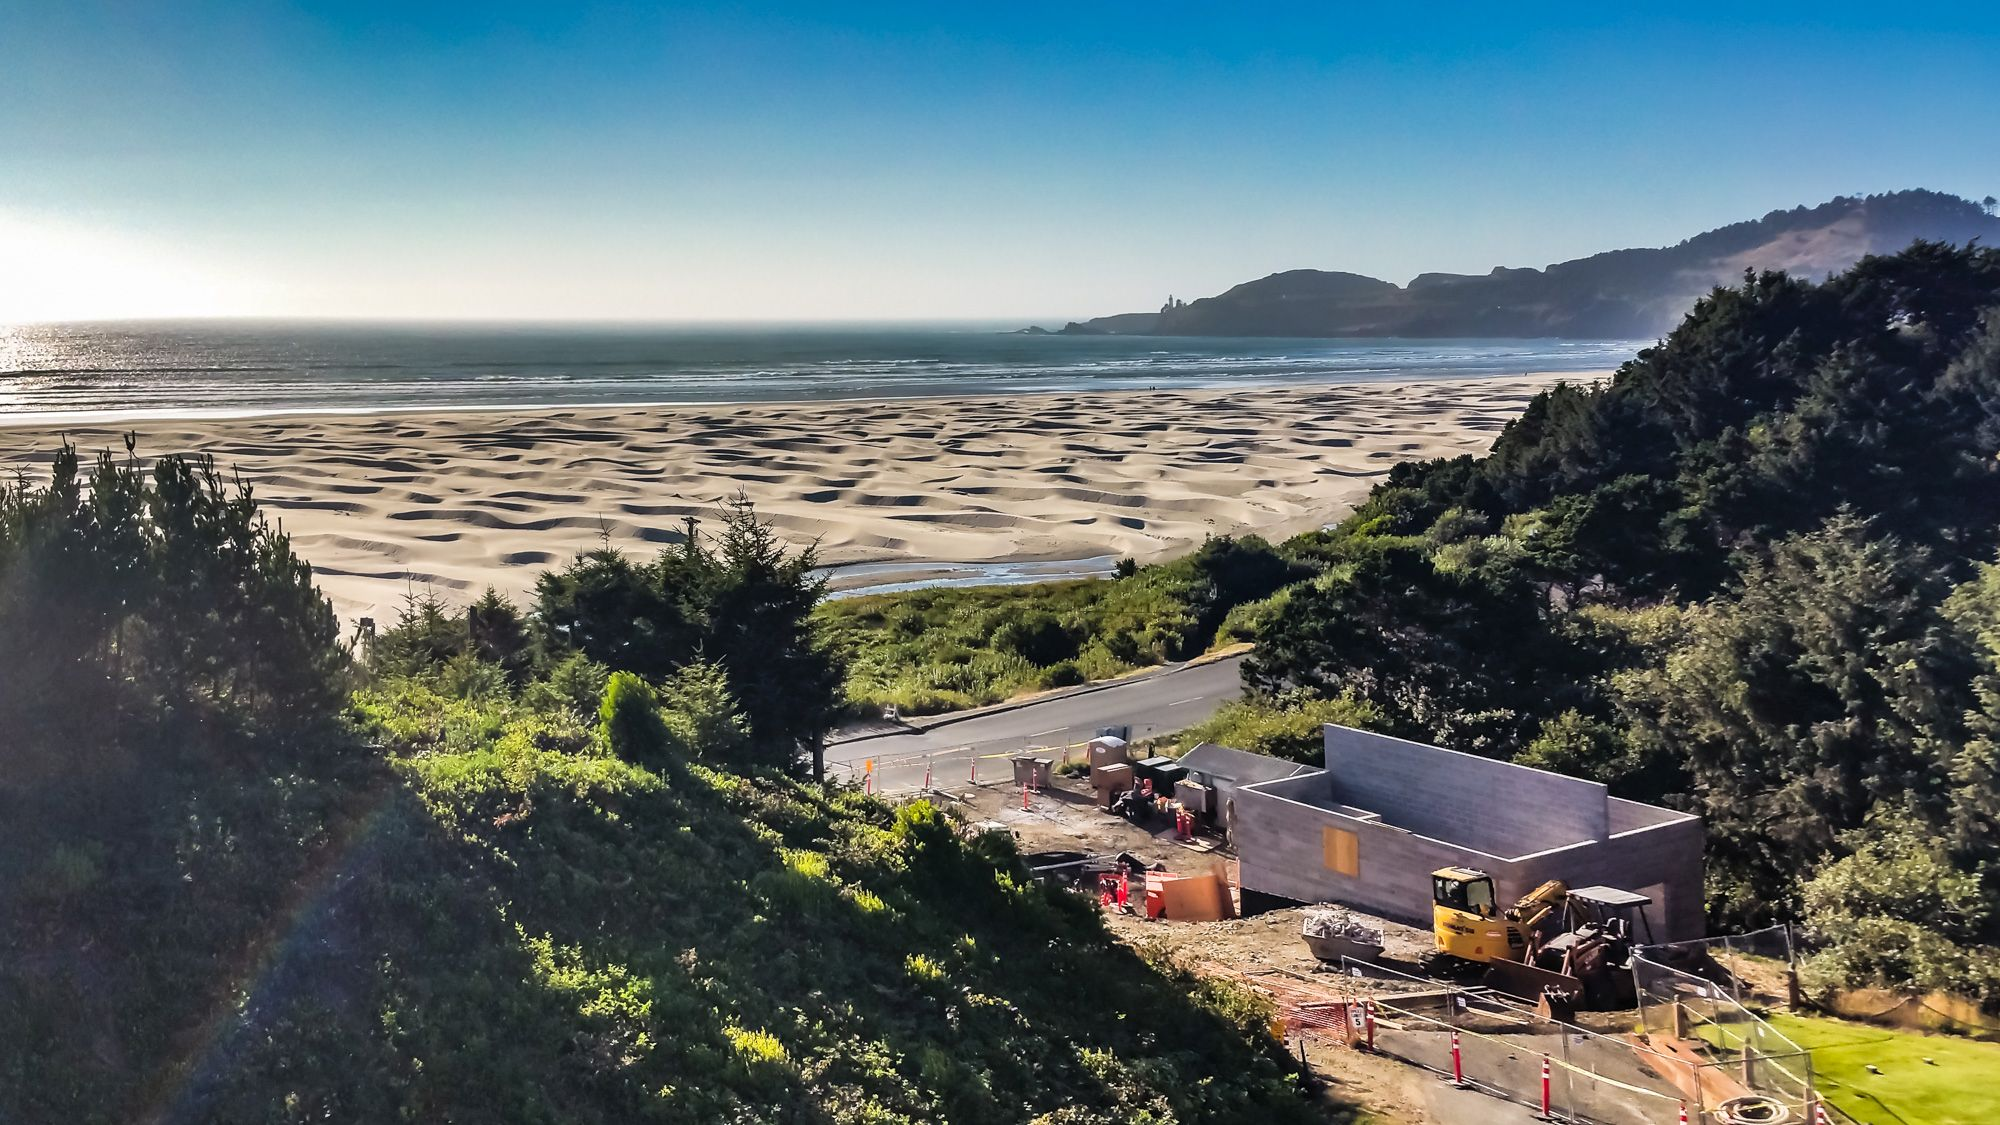 Hotel Review: Best Western Agate Beach Inn (Newport, Oregon)